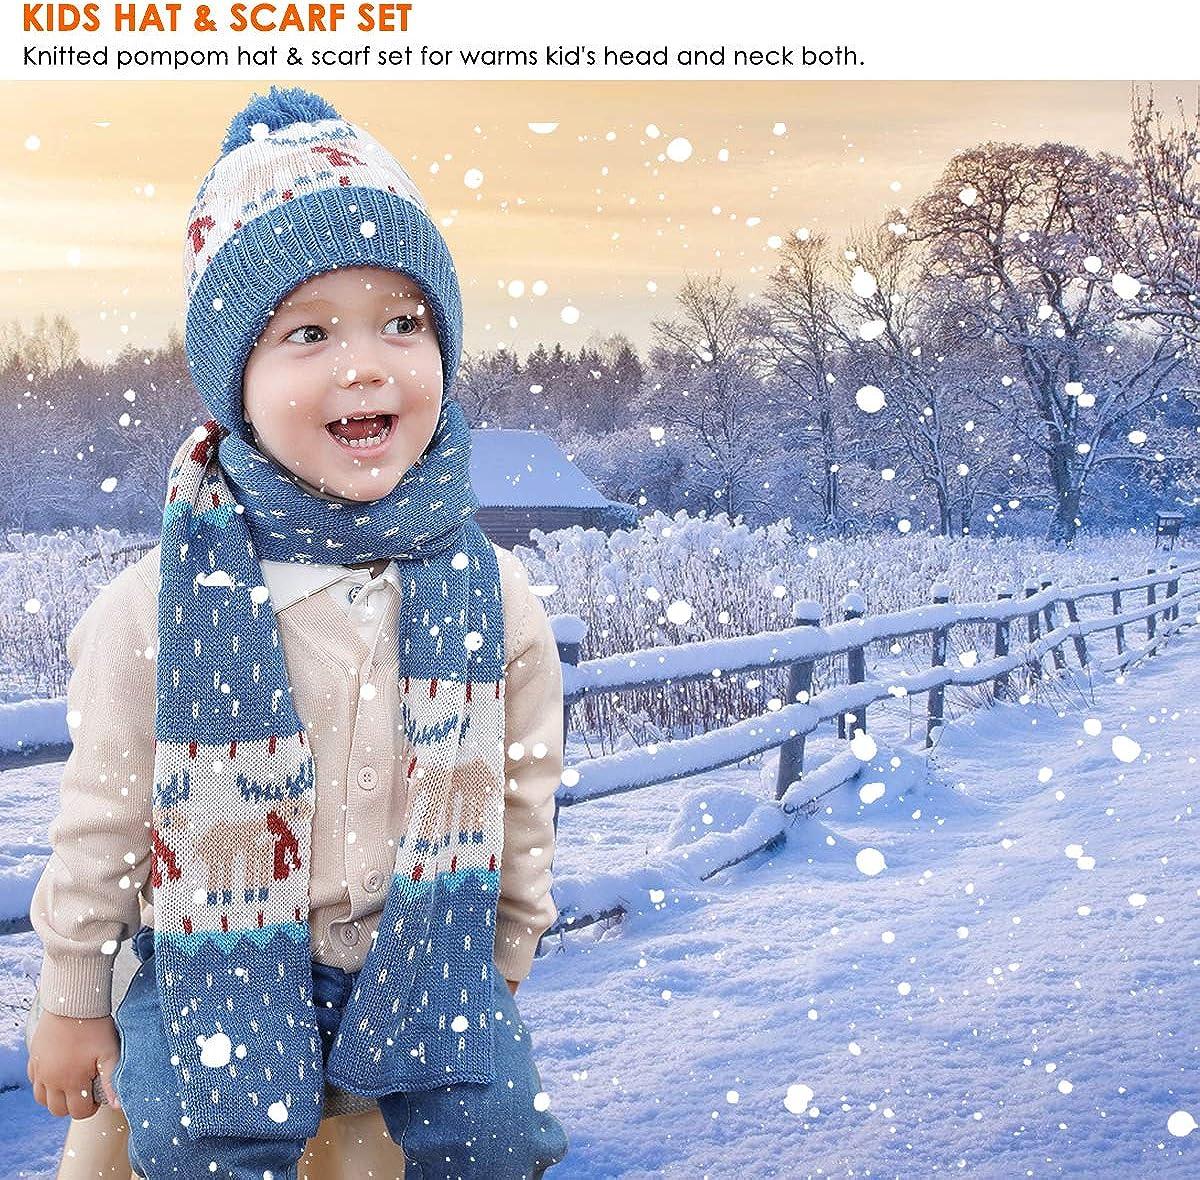 OhhGo 2Pcs Kids Boys Girls Hat Scarf Set Children Winter Knitted Warm Hat Neck Warmer for 1-4 Year Old Kids